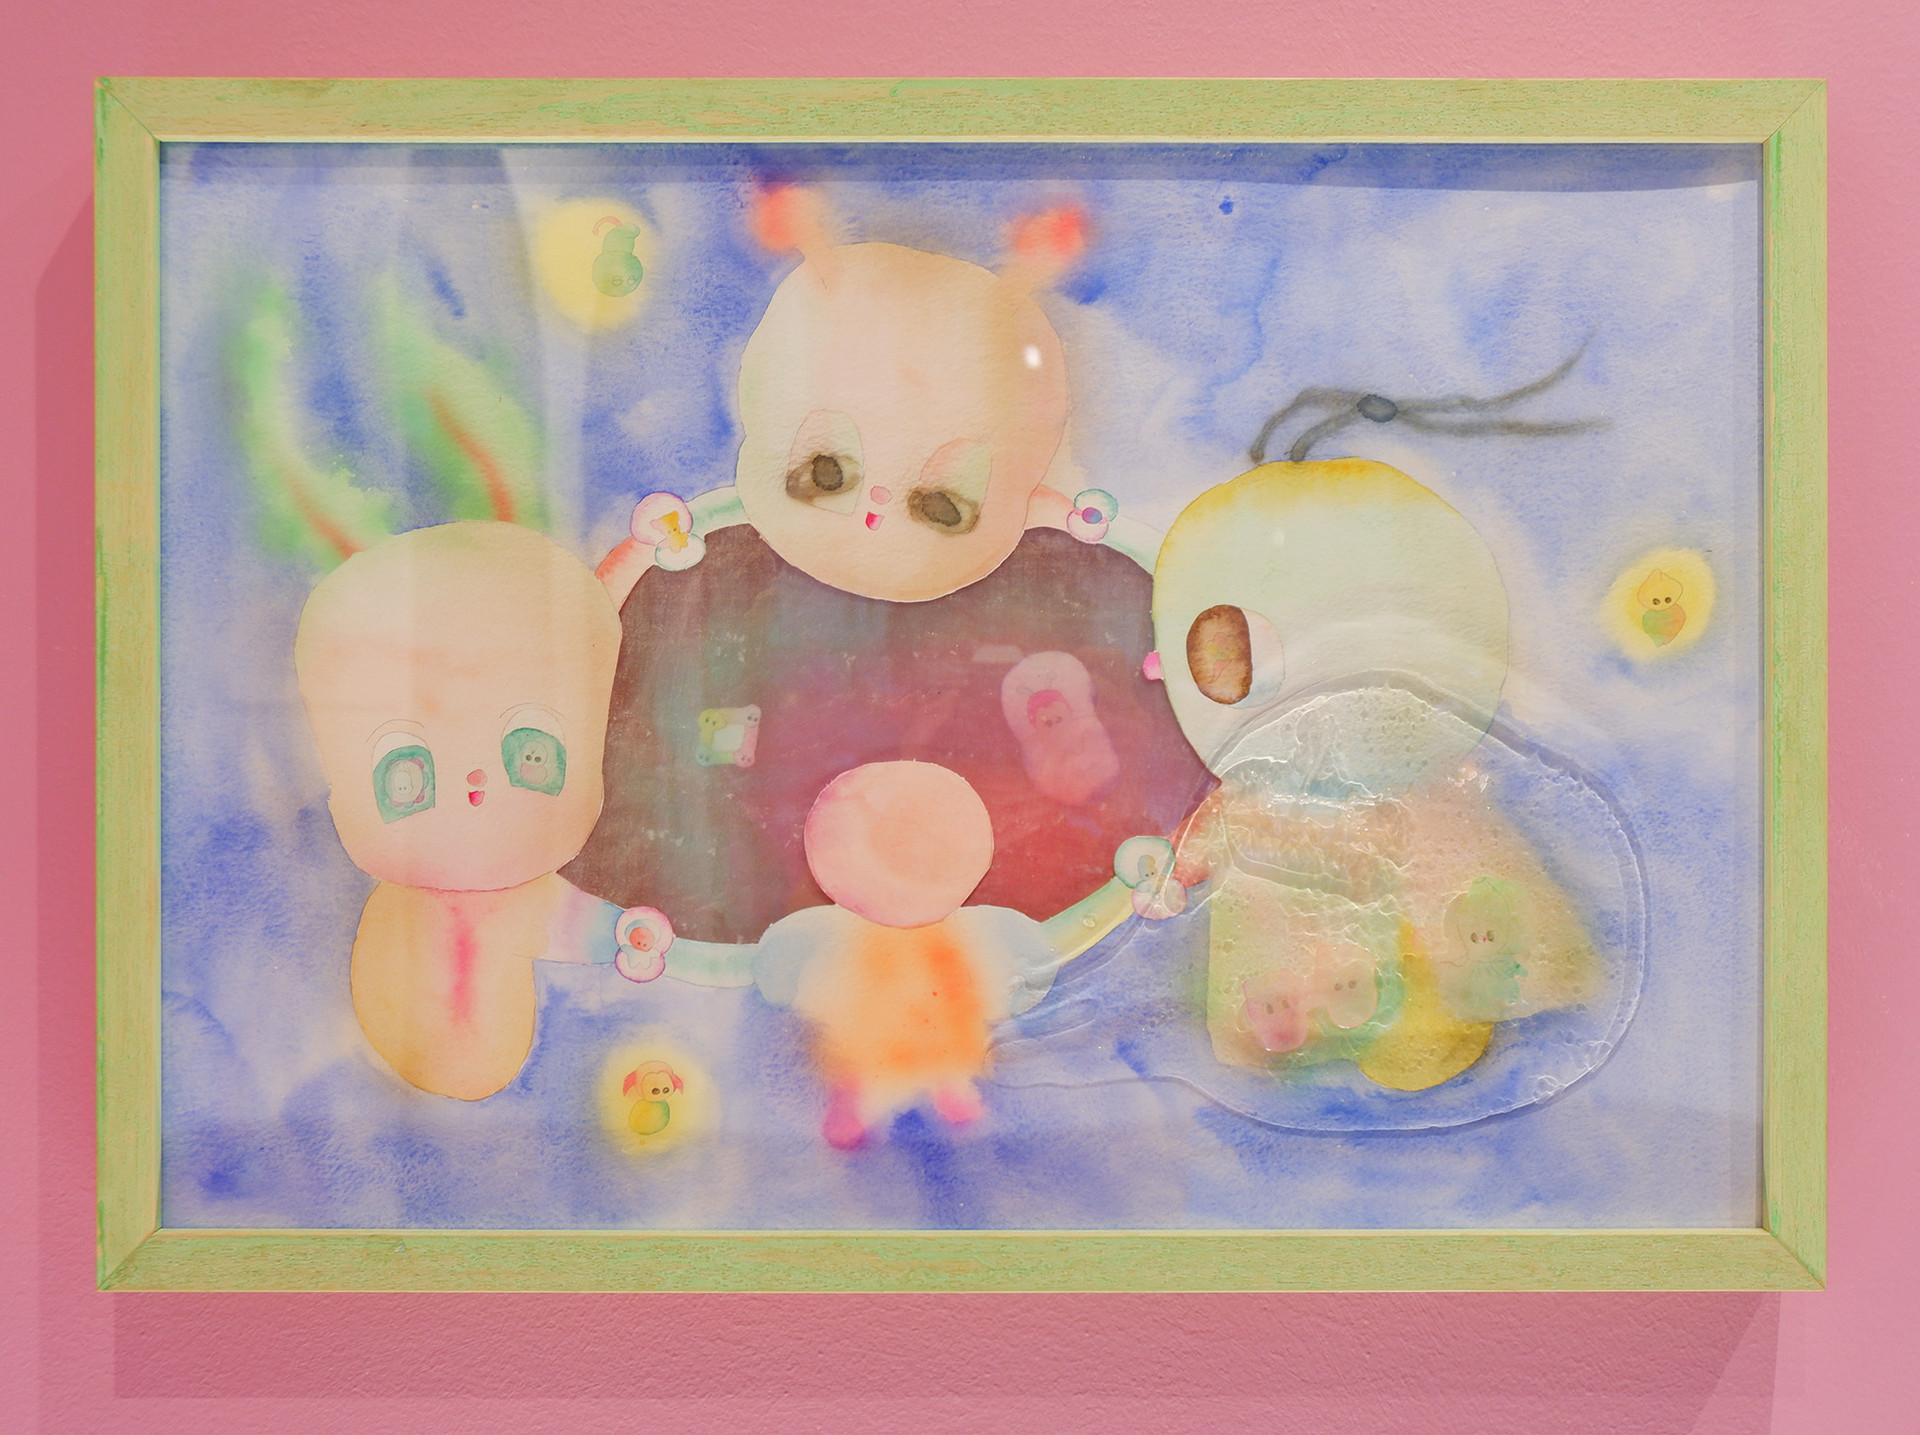 Nhozagri Lets Play, 2019 Watercolor on paper, resin 40 x 50 cm